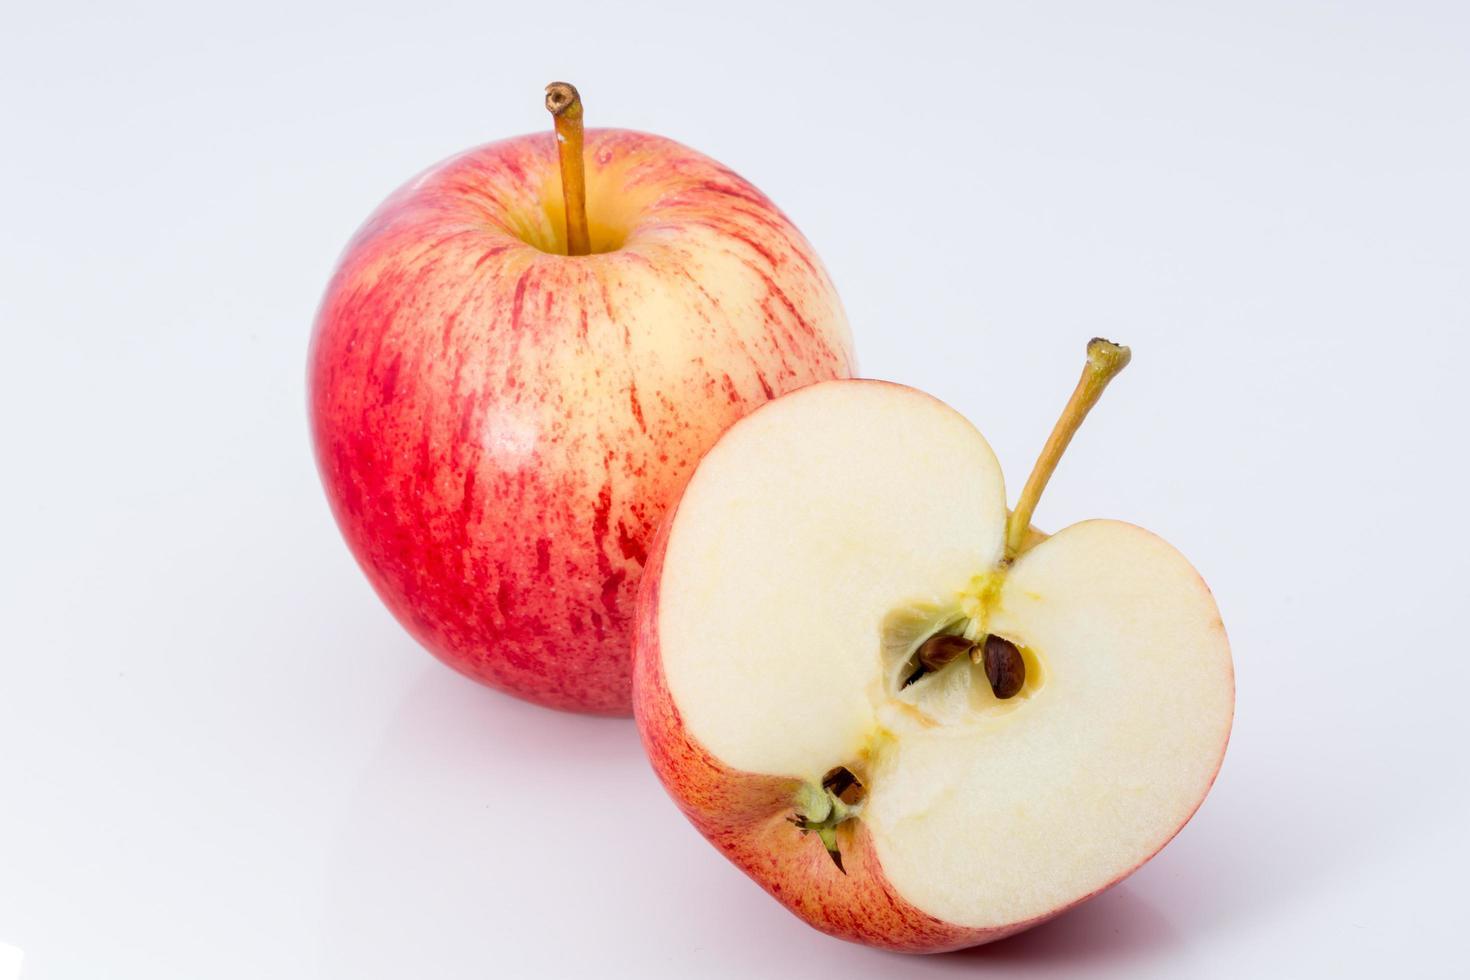 Apples on white background photo